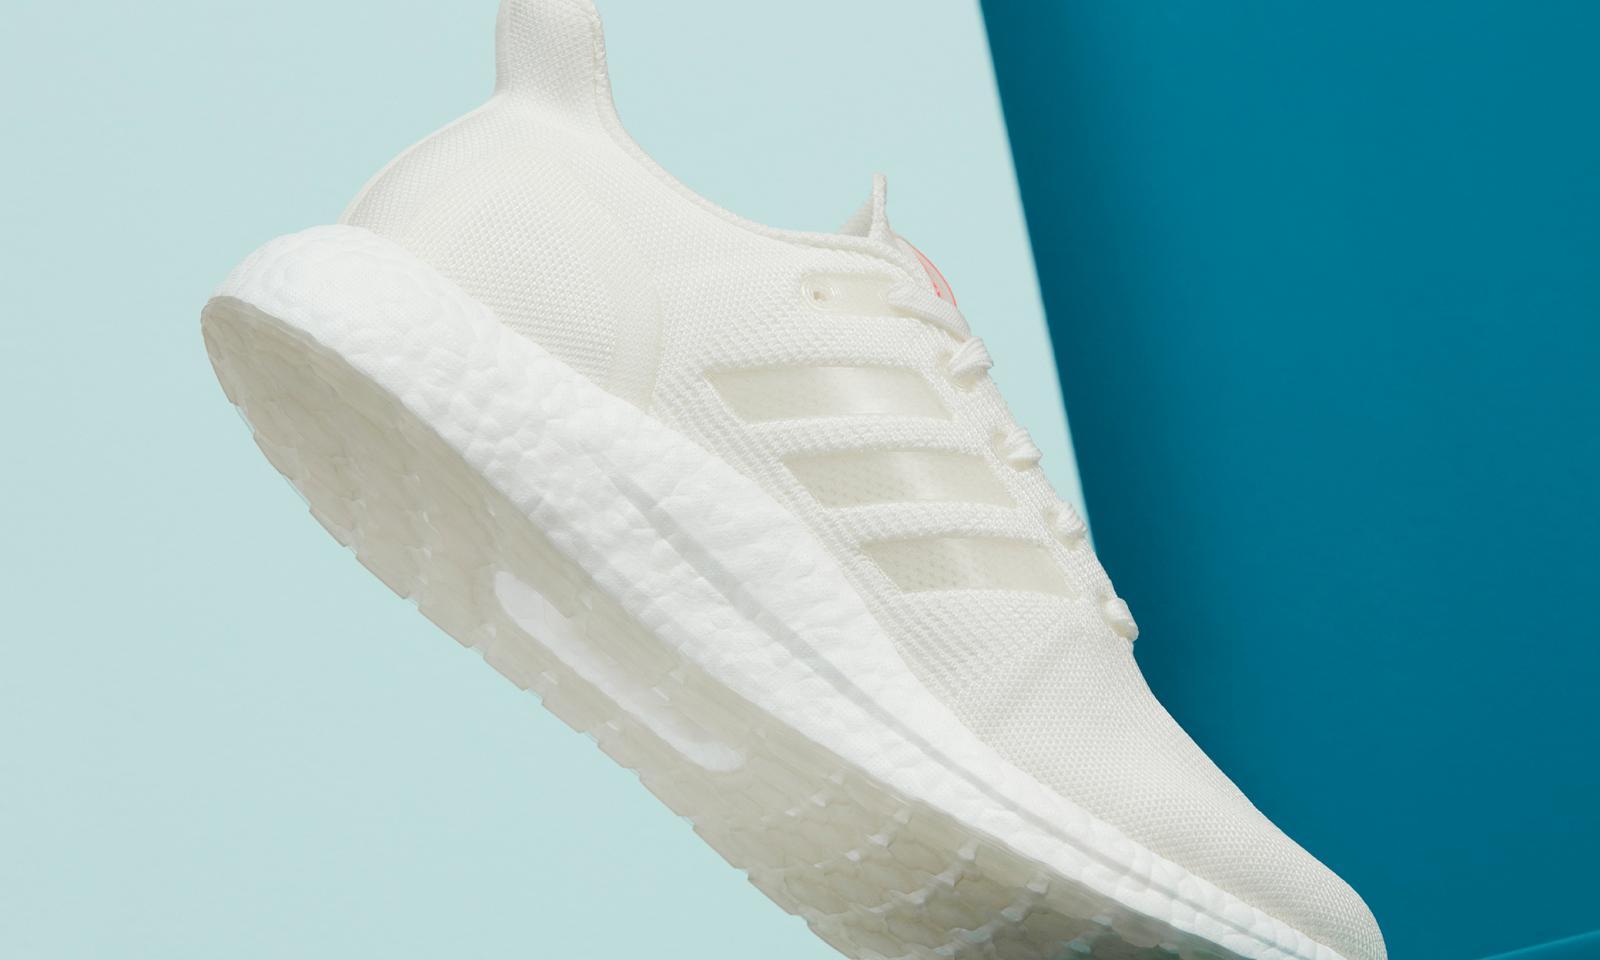 adidas 发布可循环跑鞋第三代产品 ULTRABOOST DNA LOOP